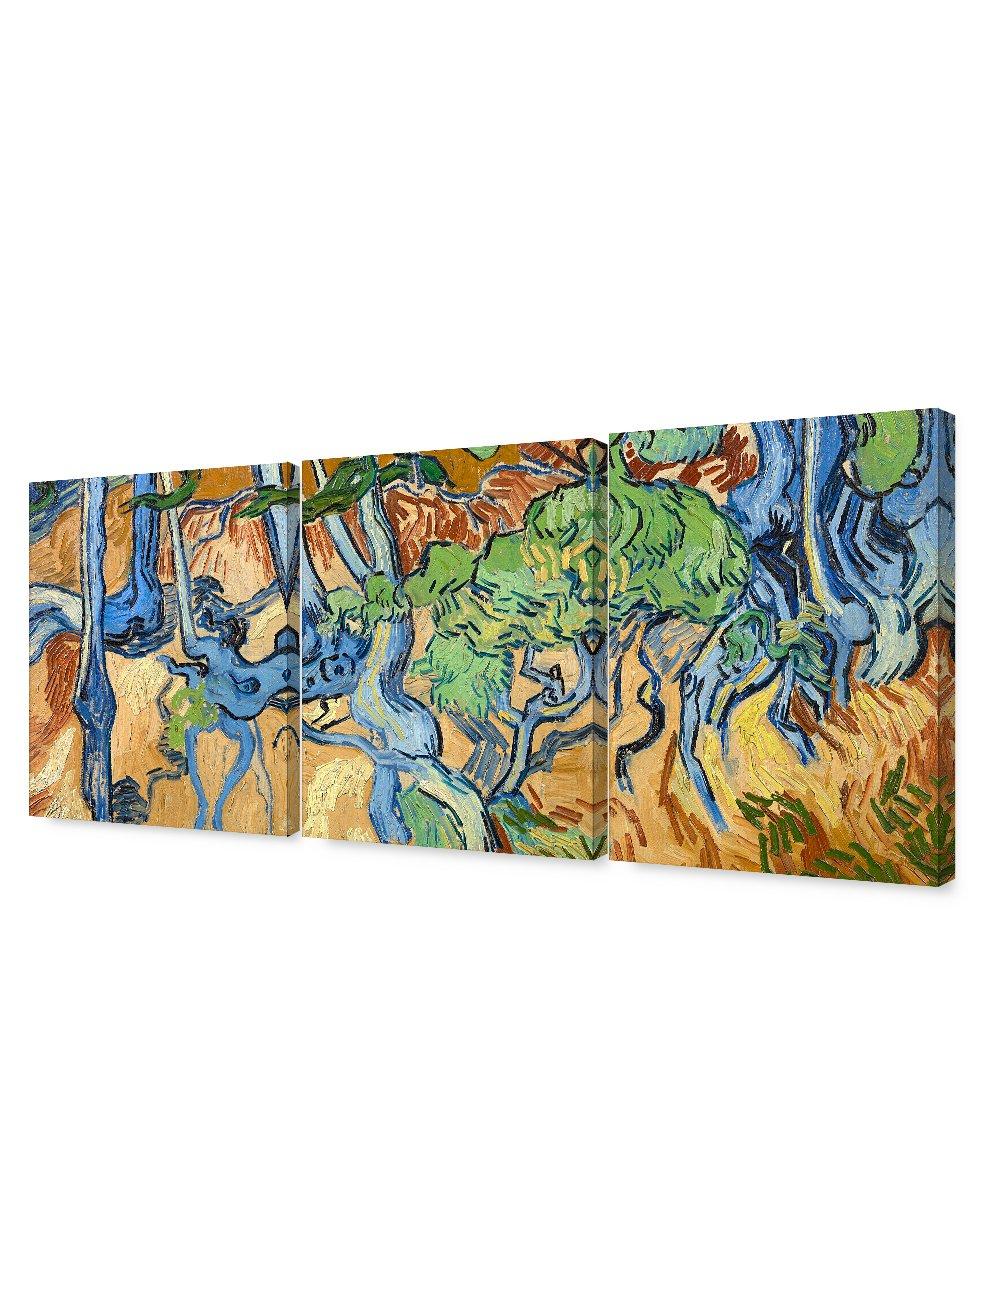 DECORARTS - Tree Roots (3 Piece Set), Vincent Van Gogh Art Reproduction. Giclee Canvas Prints Wall Art for Home Decor. 16x20, 3pcs/Set